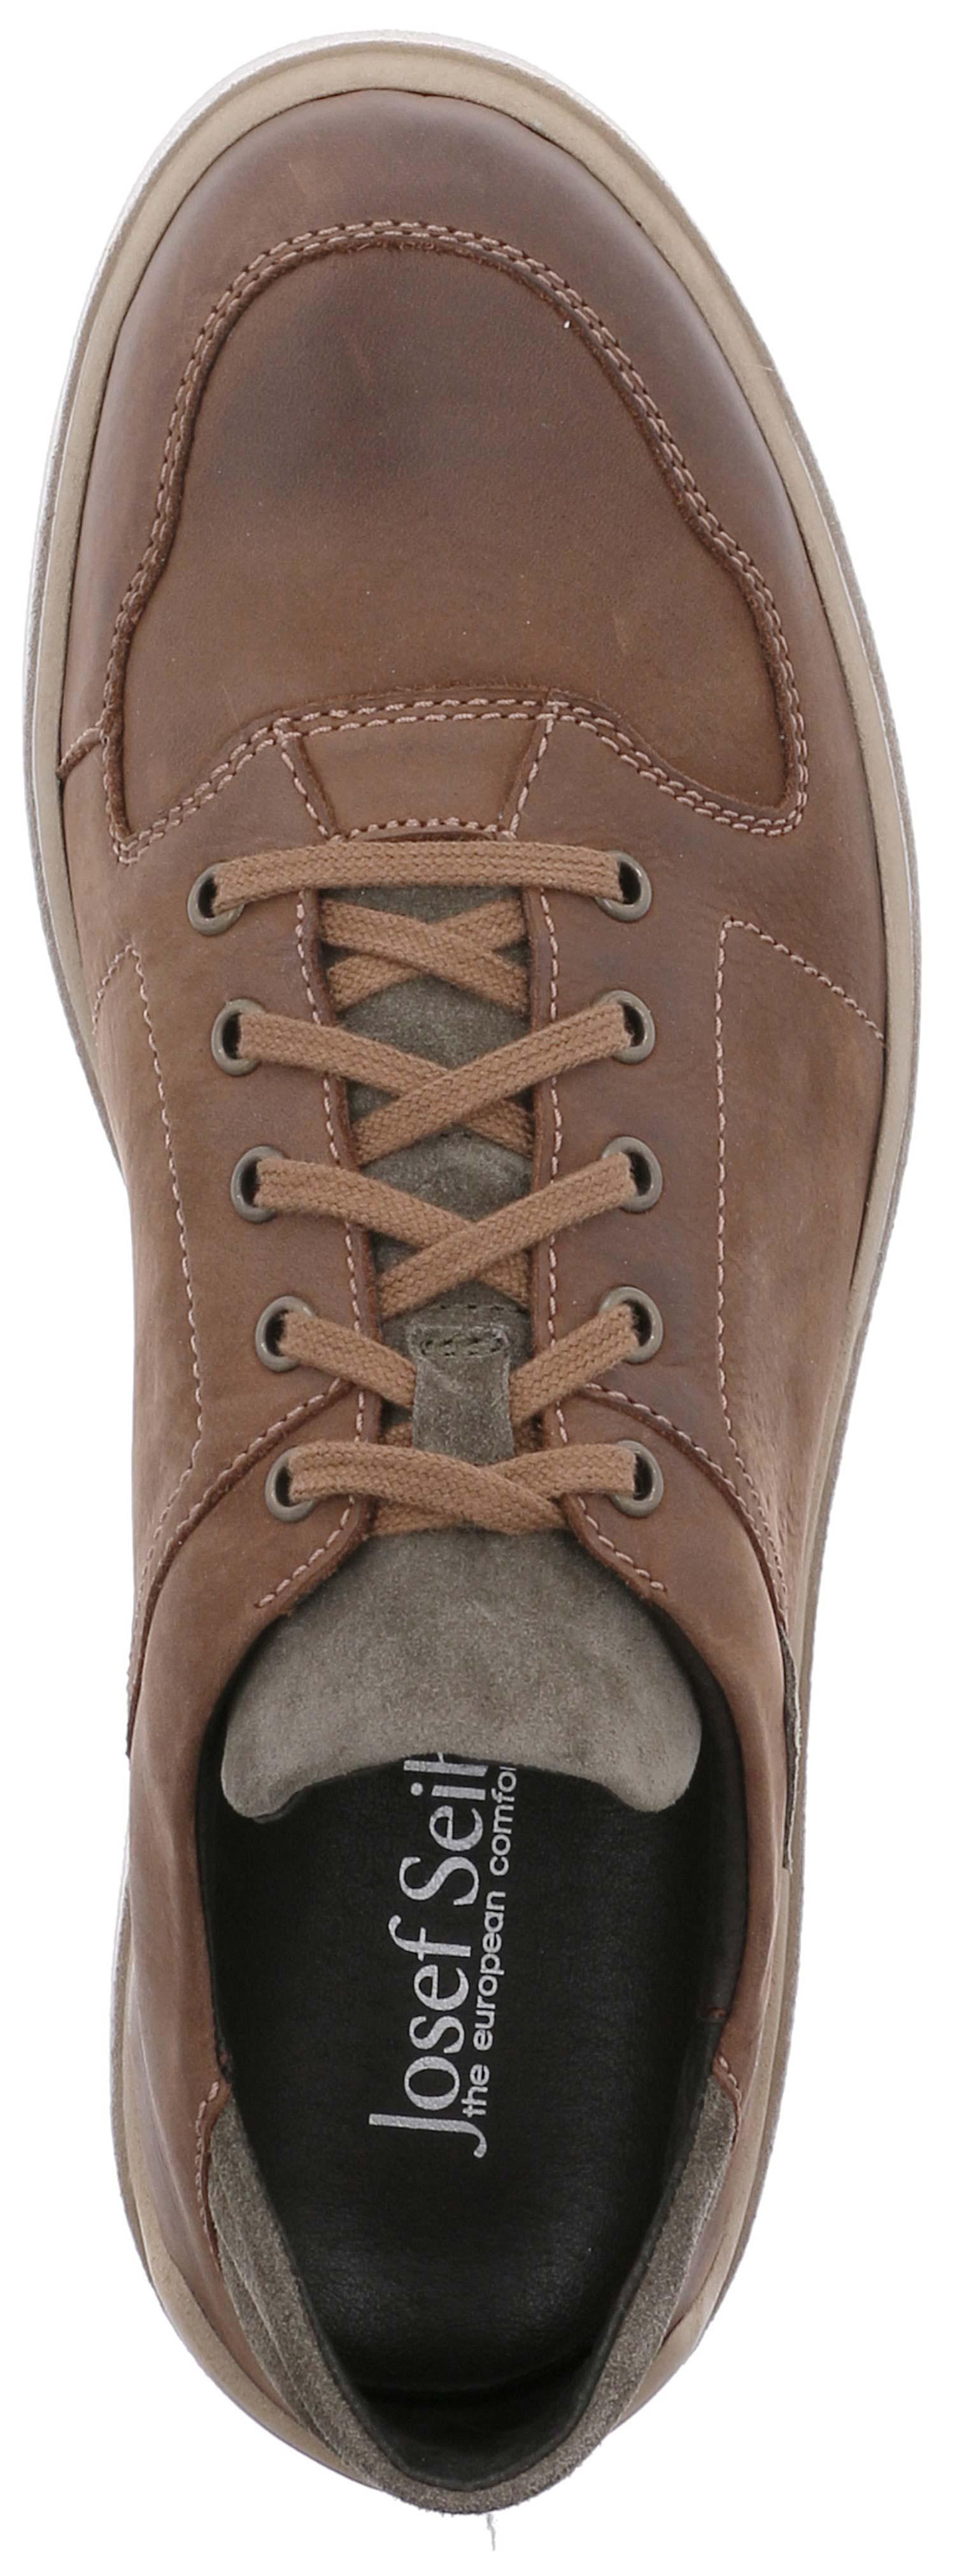 Josef Josef Josef Seibel rudi señores semi zapato Slipper ocio 11743994/351 marrón NUEVO 063469